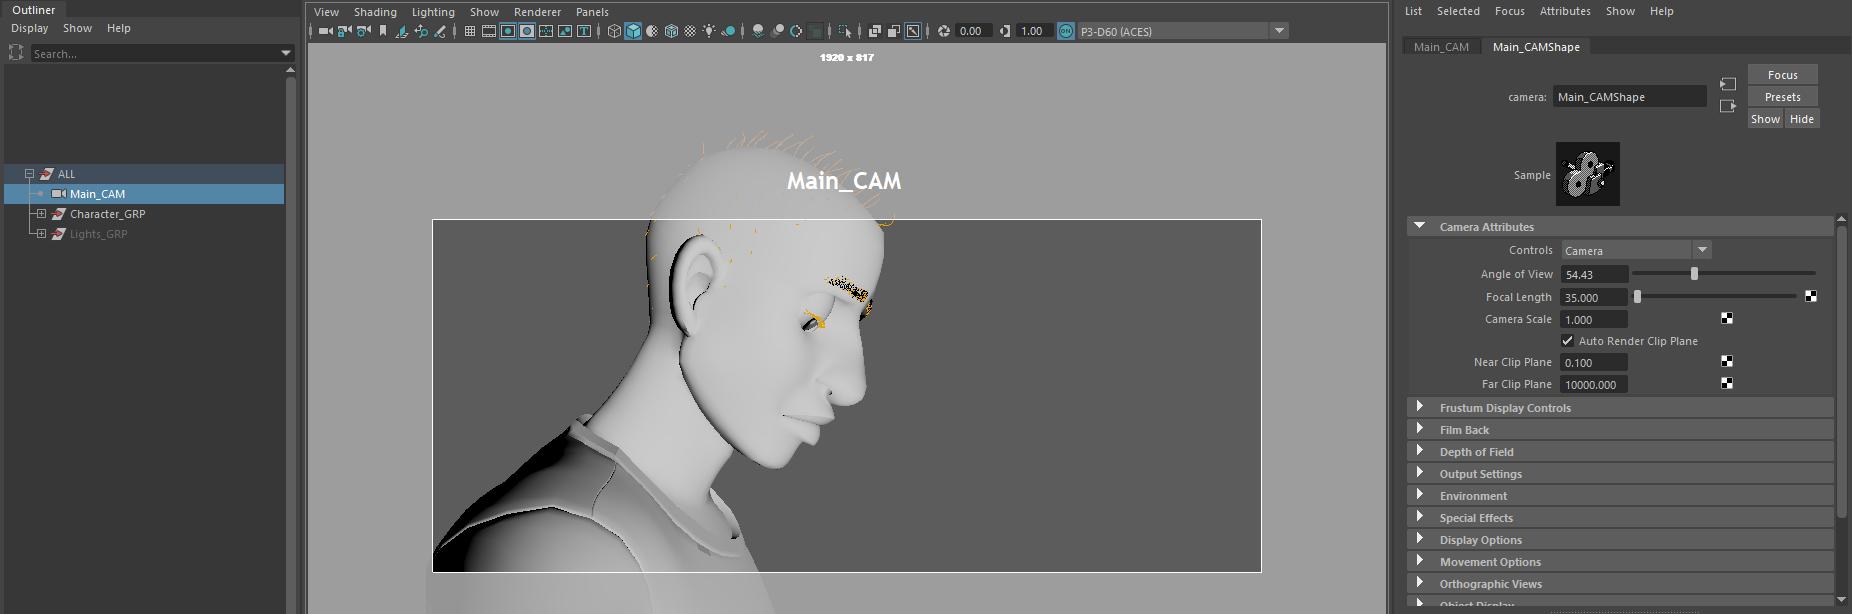 EX03_One_JoanPons_02_Screenshot_02_CAM